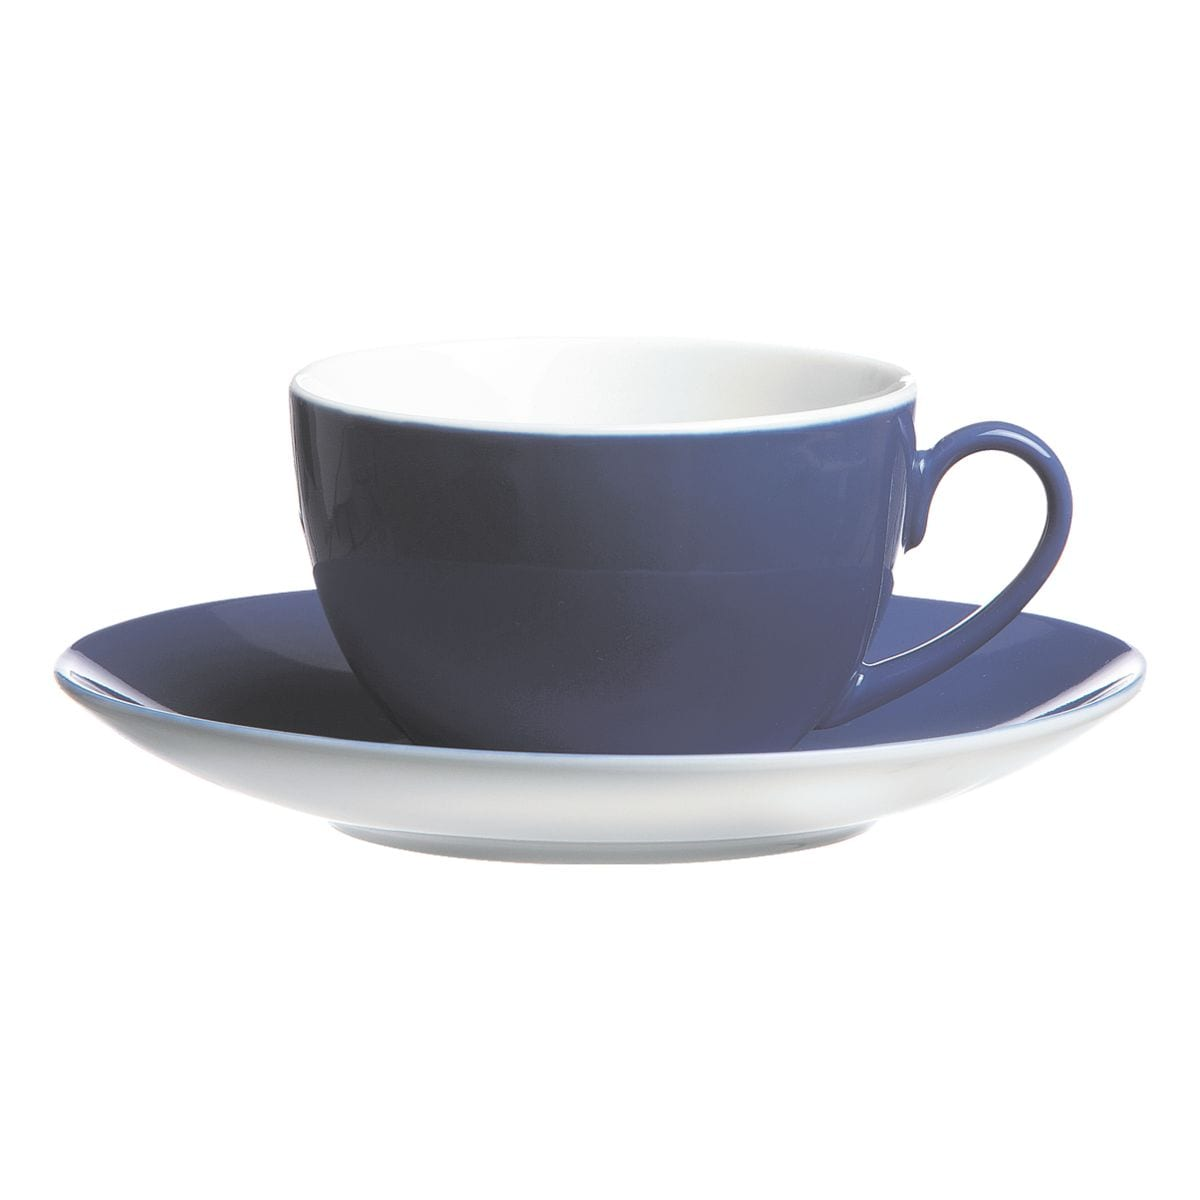 Ritzenhoff & Breker 4-delige koffiekopjesset  »Doppio«, incl. schoteltjes